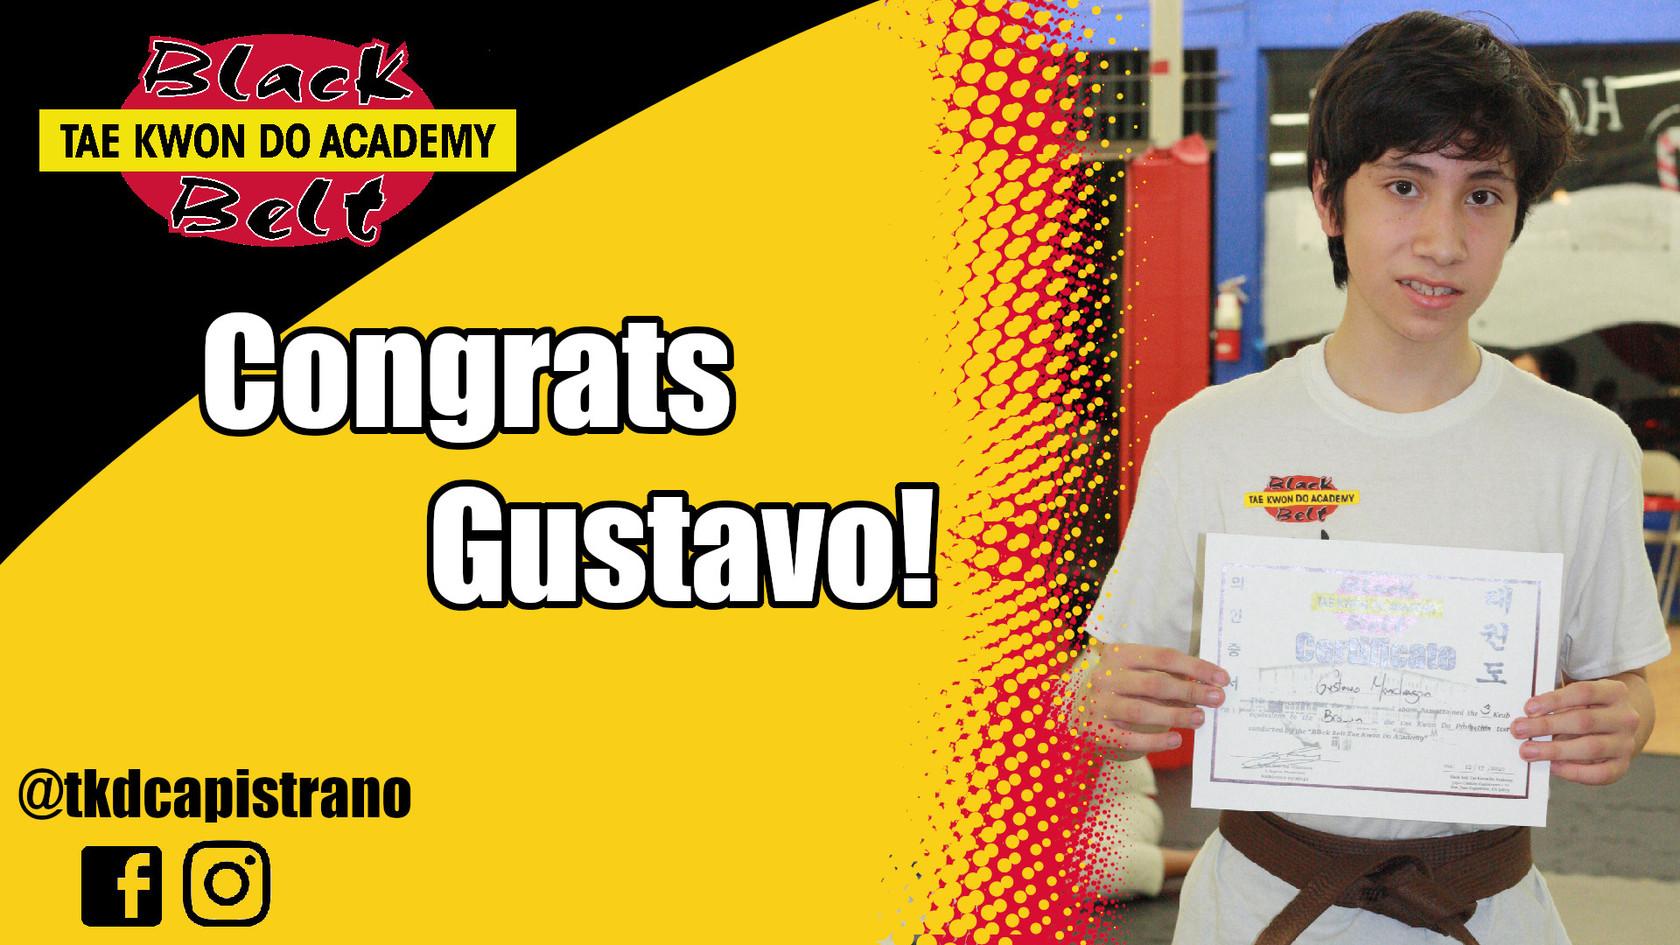 Congrats Gustavo!